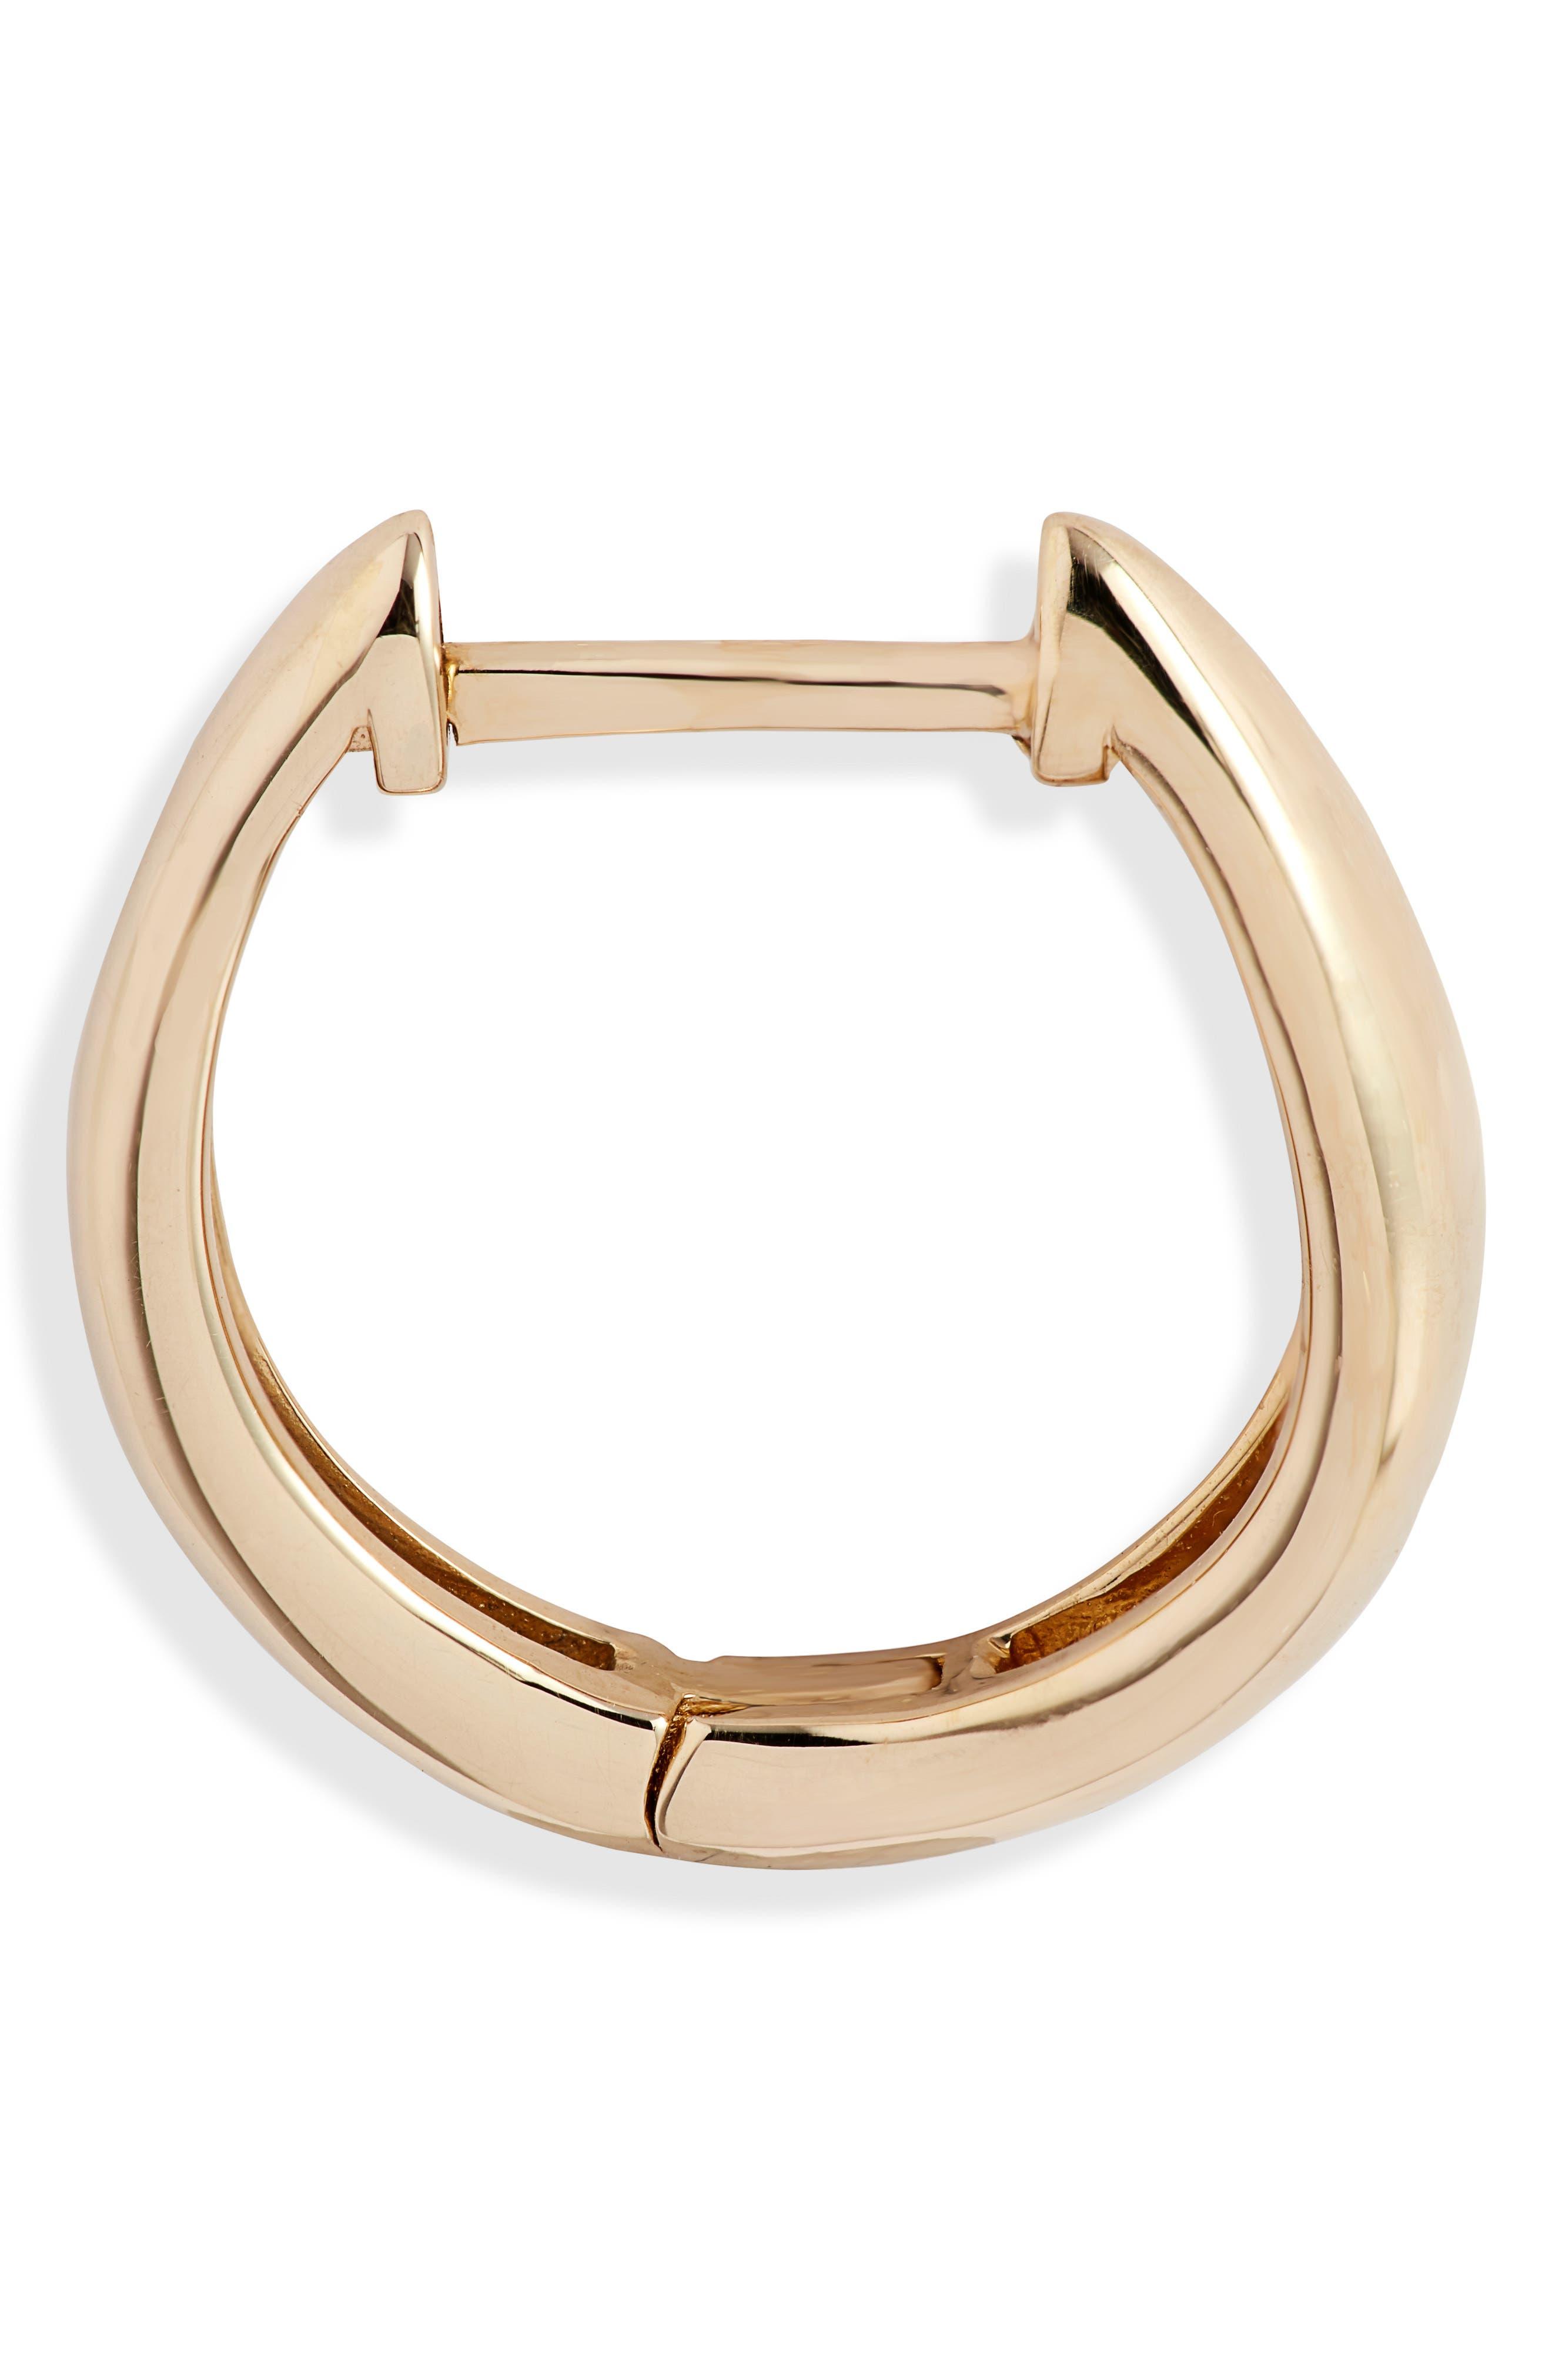 BONY LEVY,                             14K Gold Hoop Earrings,                             Alternate thumbnail 4, color,                             YELLOW GOLD/ DIA